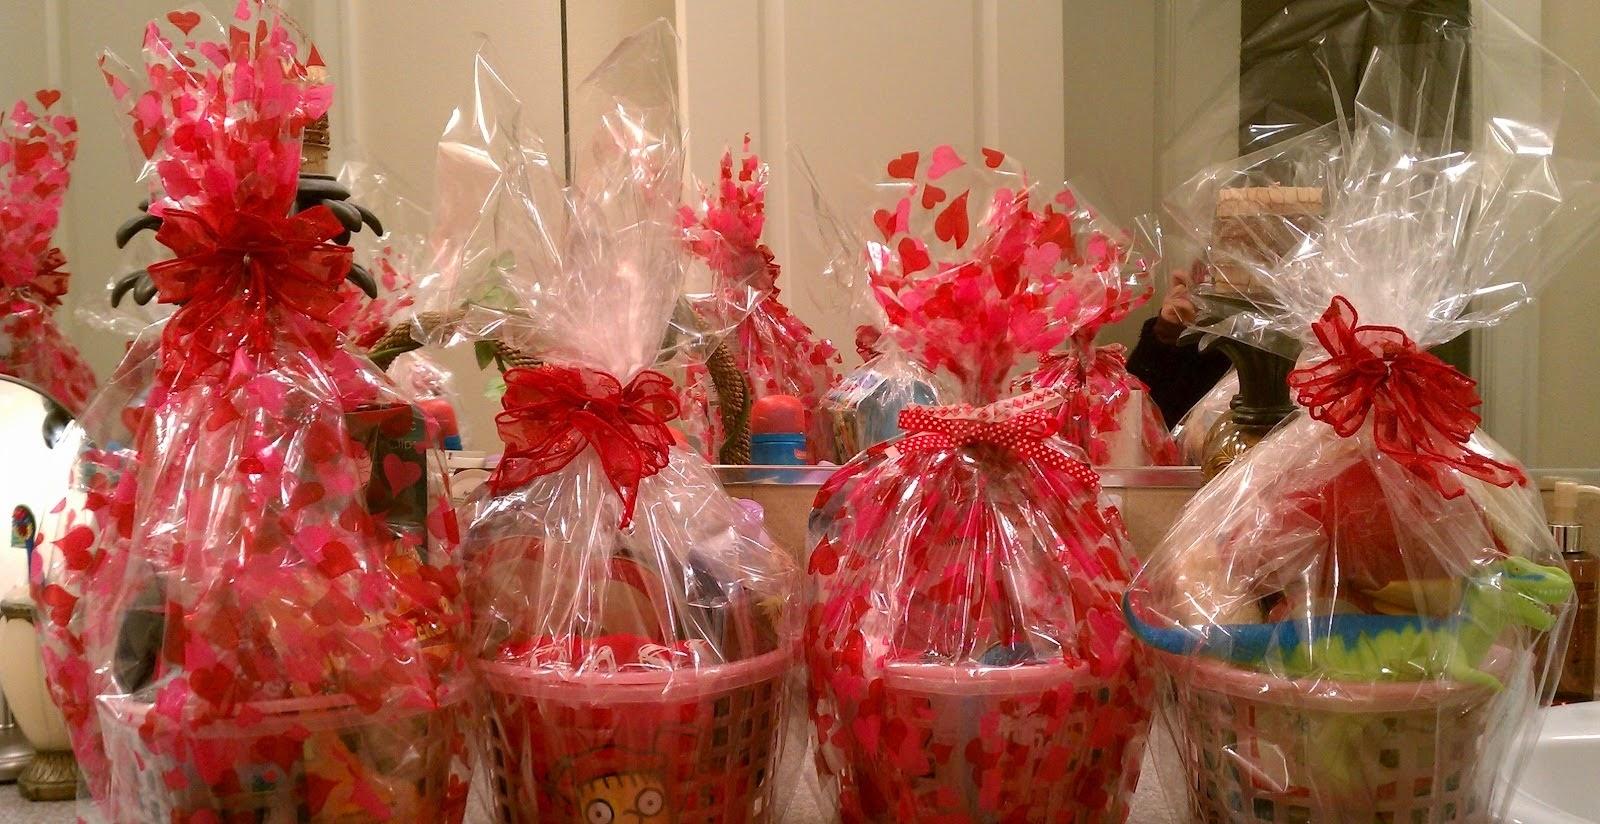 Valentines Day Small Gift Basket Ideas Www Picsbud Com